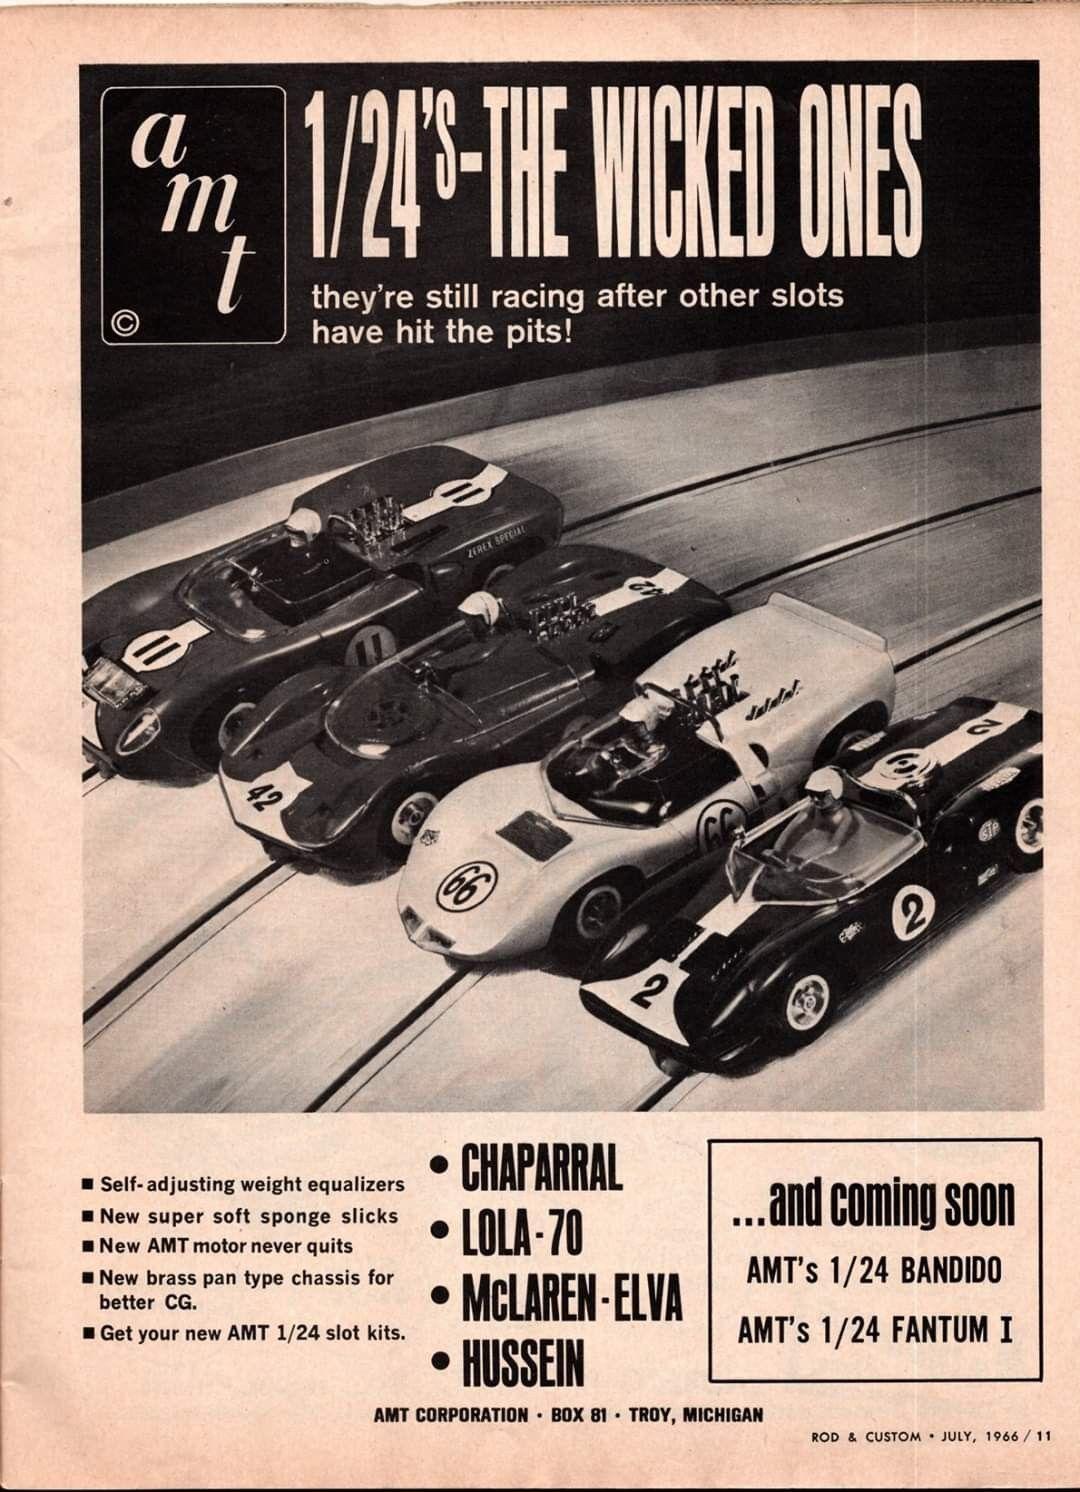 Pin By Doug On Slot Cars In 2020 Slot Car Racing Slot Racing Slot Cars